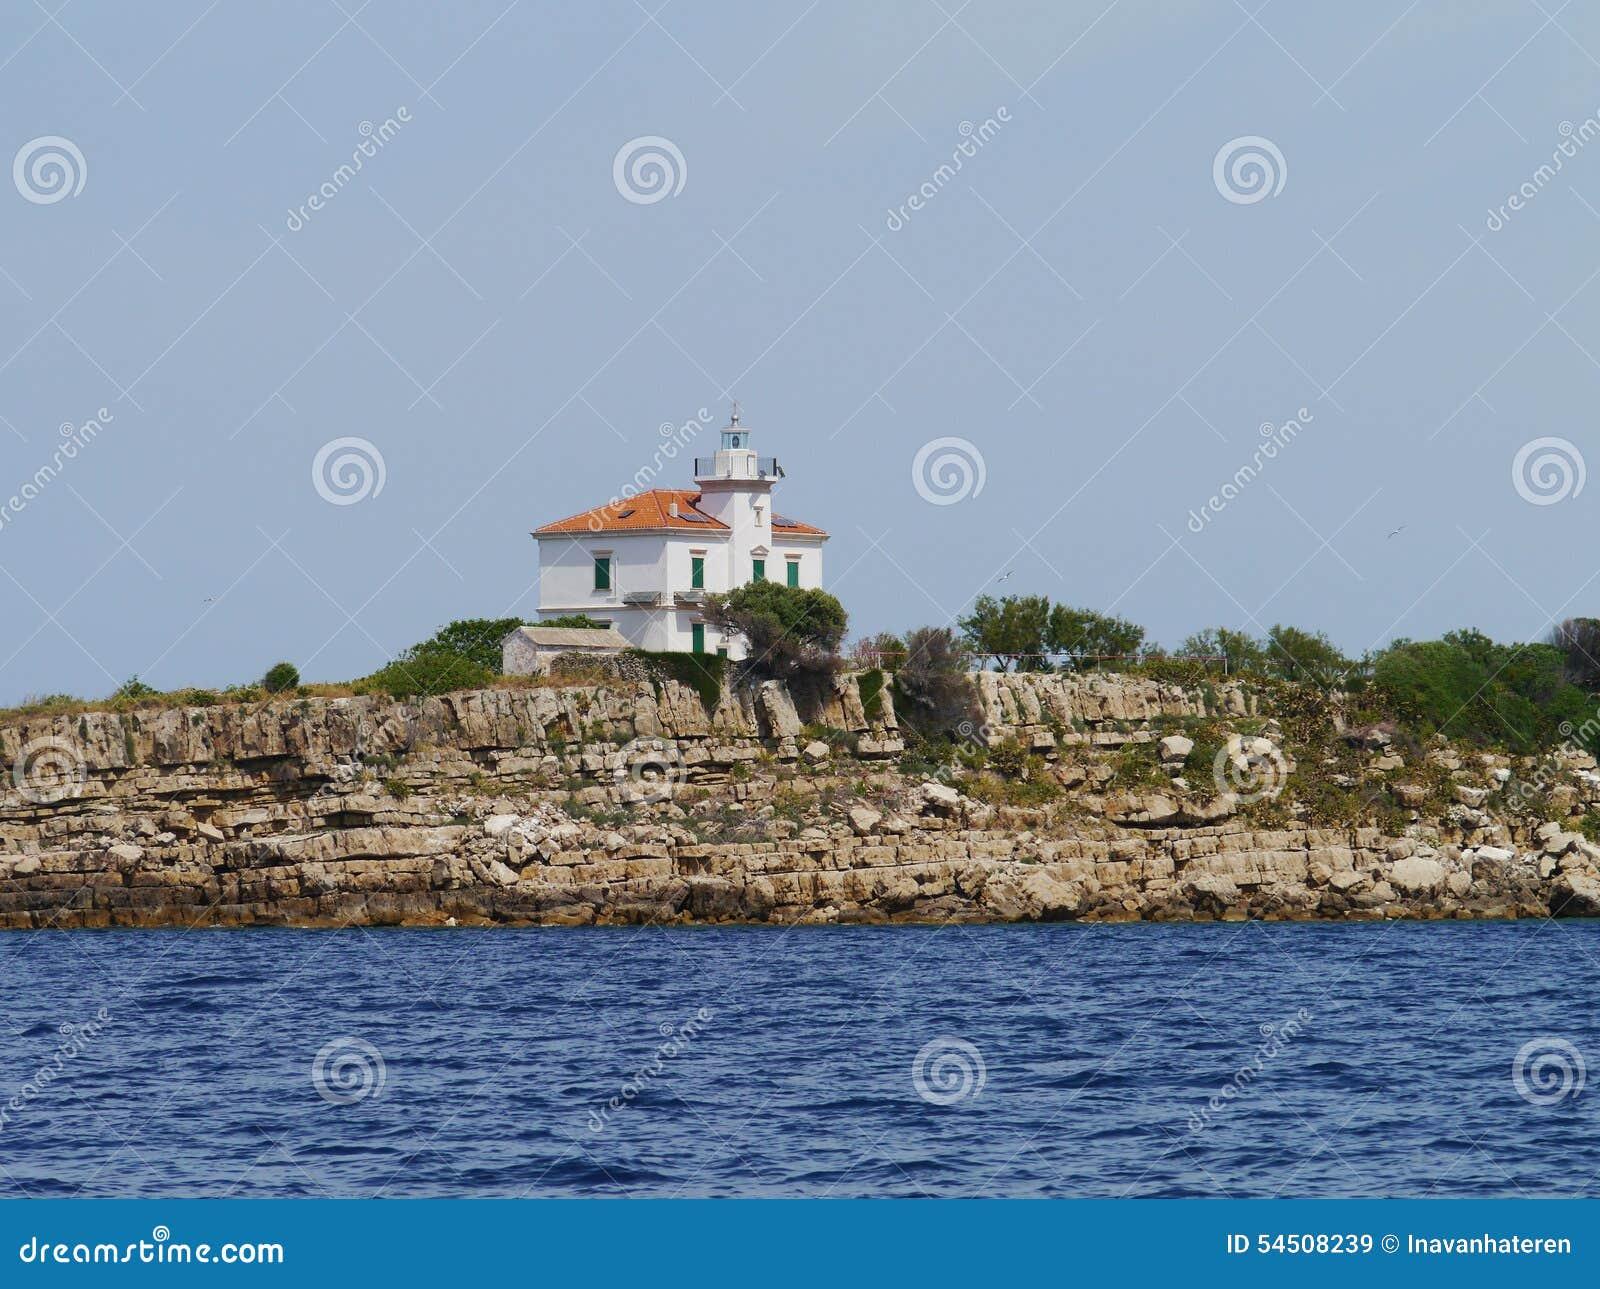 Le phare de Plocica en Croatie